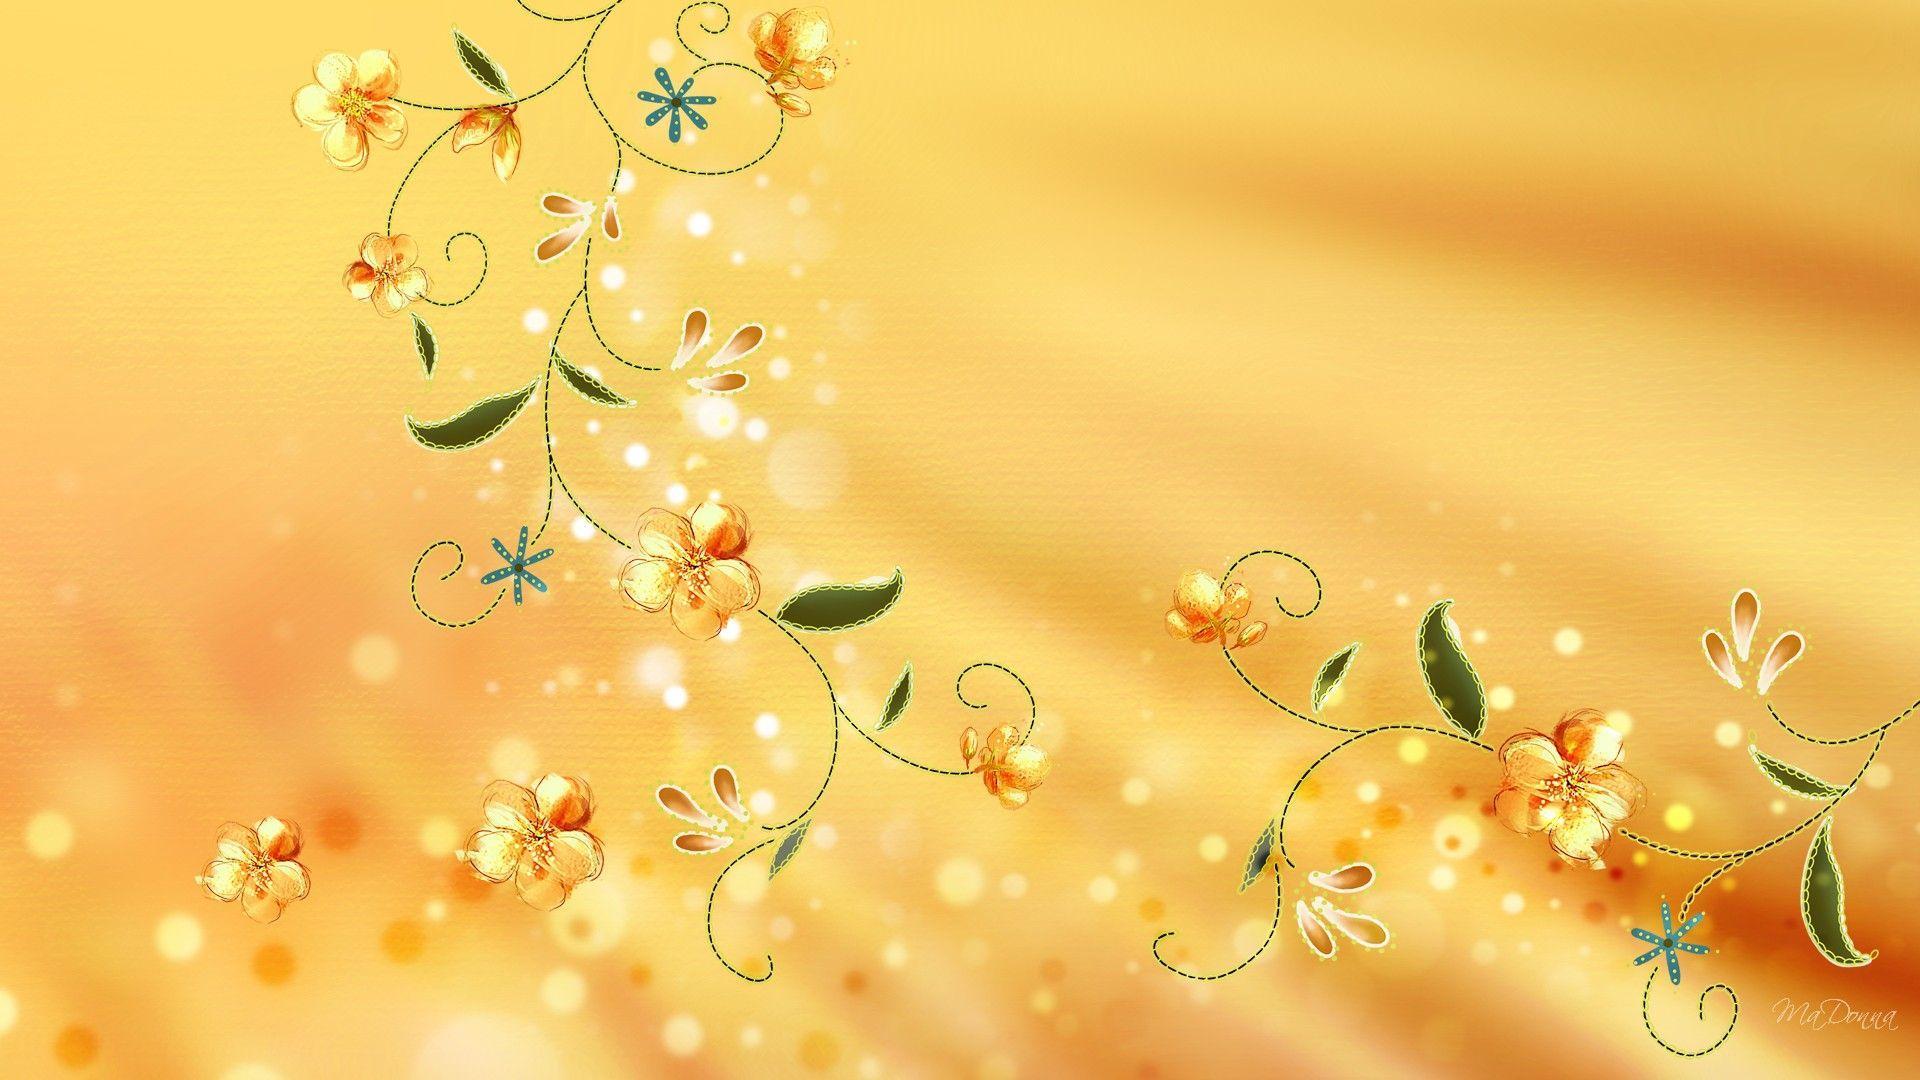 Golden Color Backgrounds Wallpaper Cave